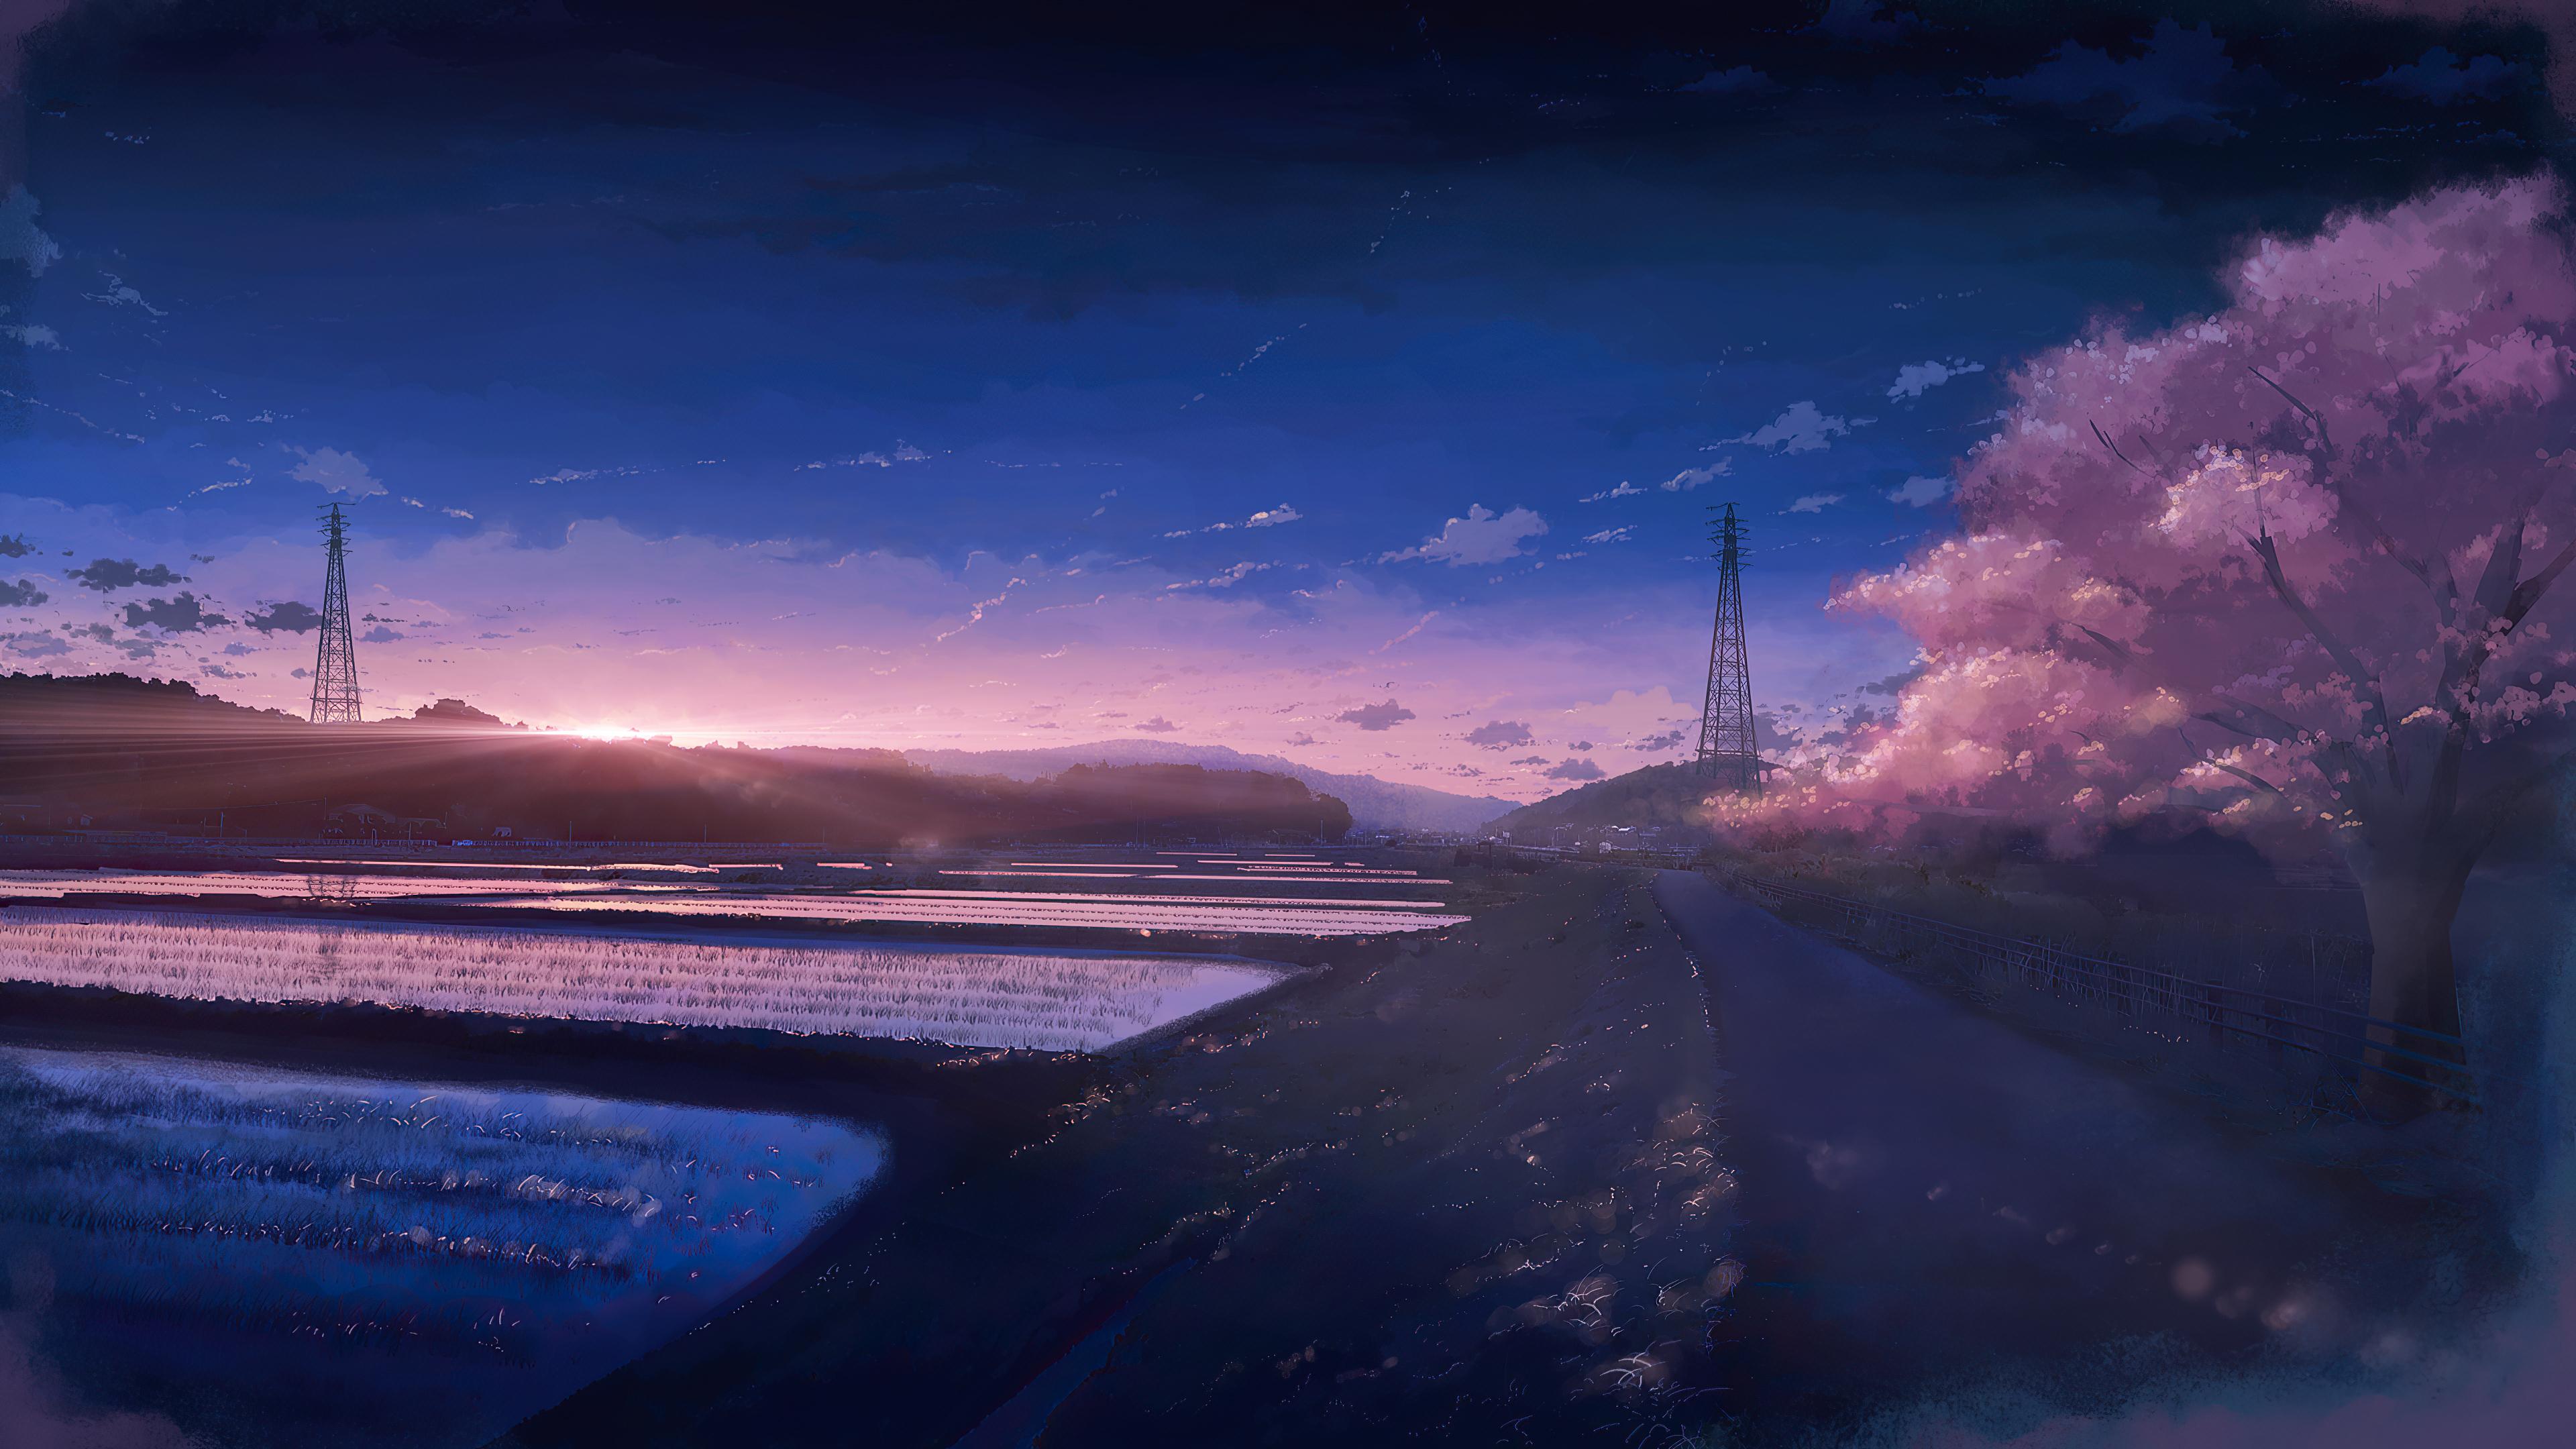 anime scenery field 4k 1602436640 - Anime Scenery Field 4k - Anime Scenery Field 4k wallpapers